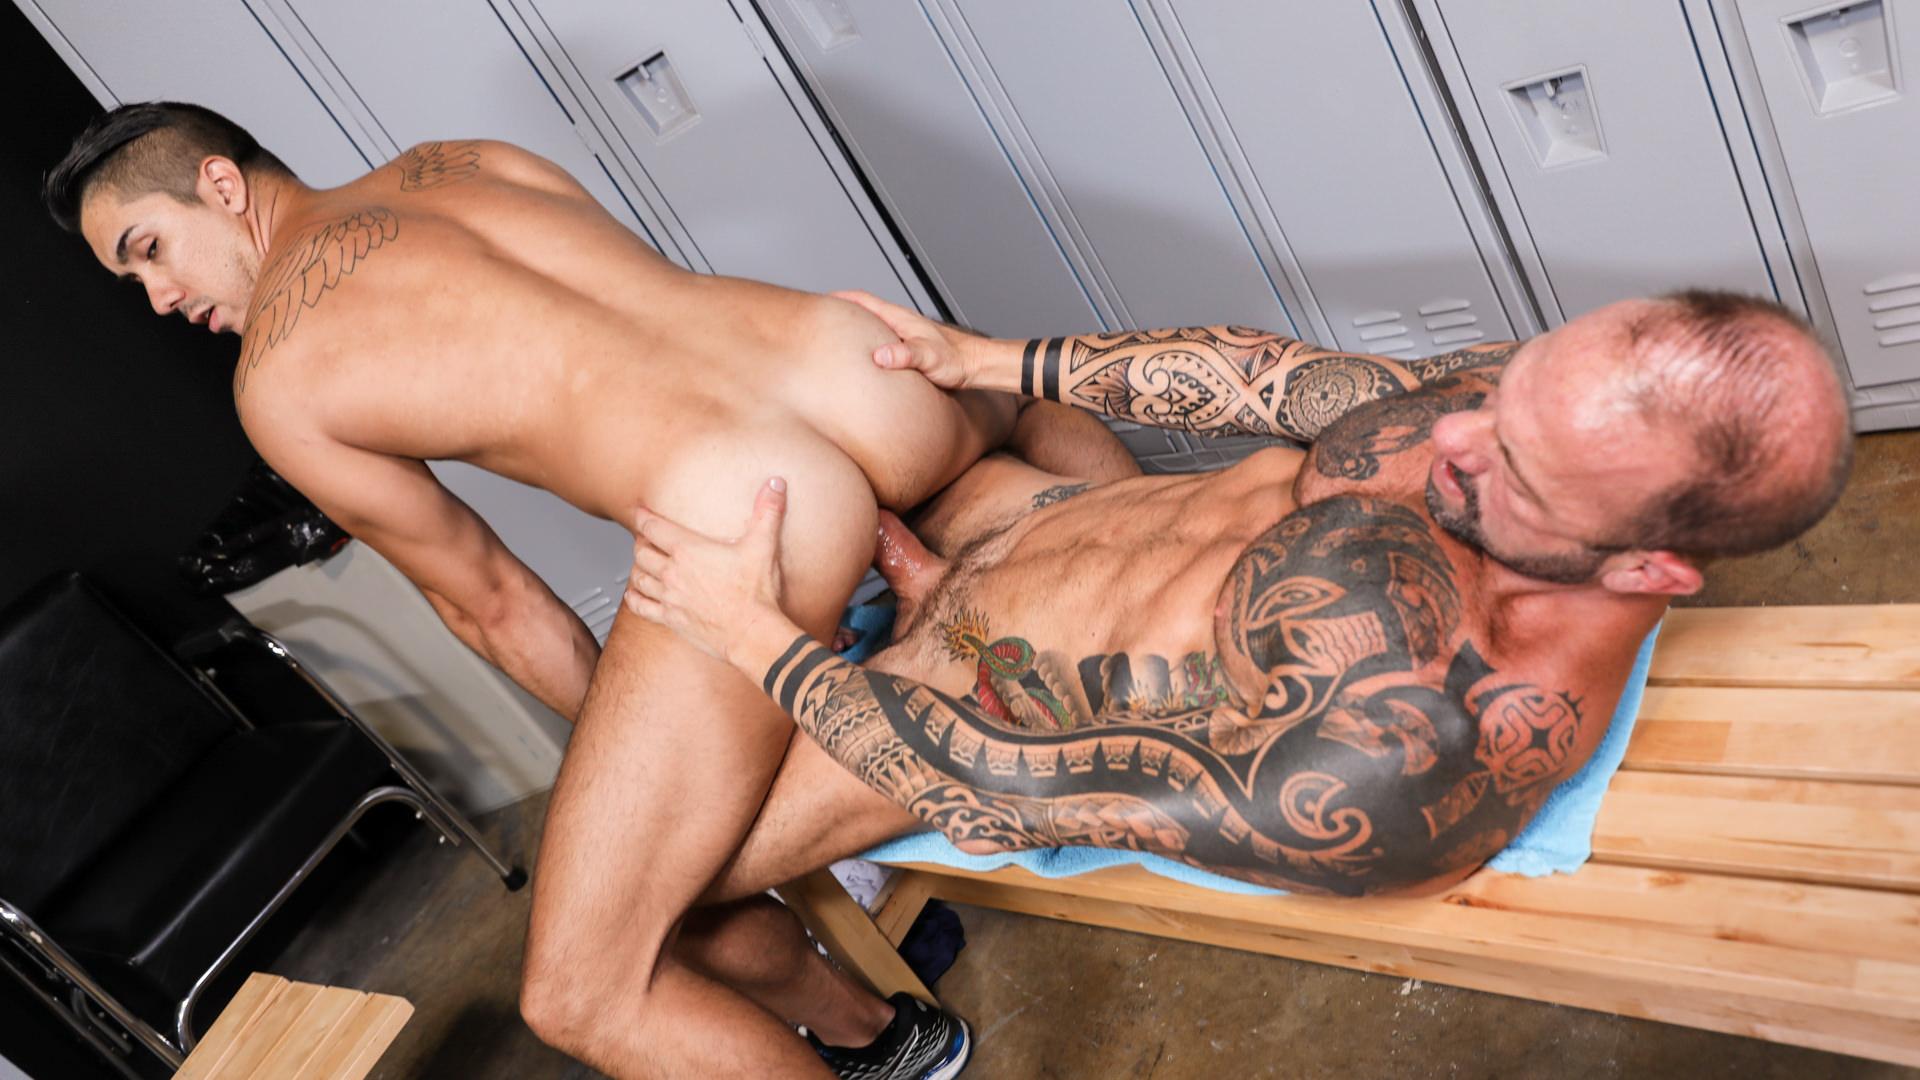 Big Tatts & Big Cock